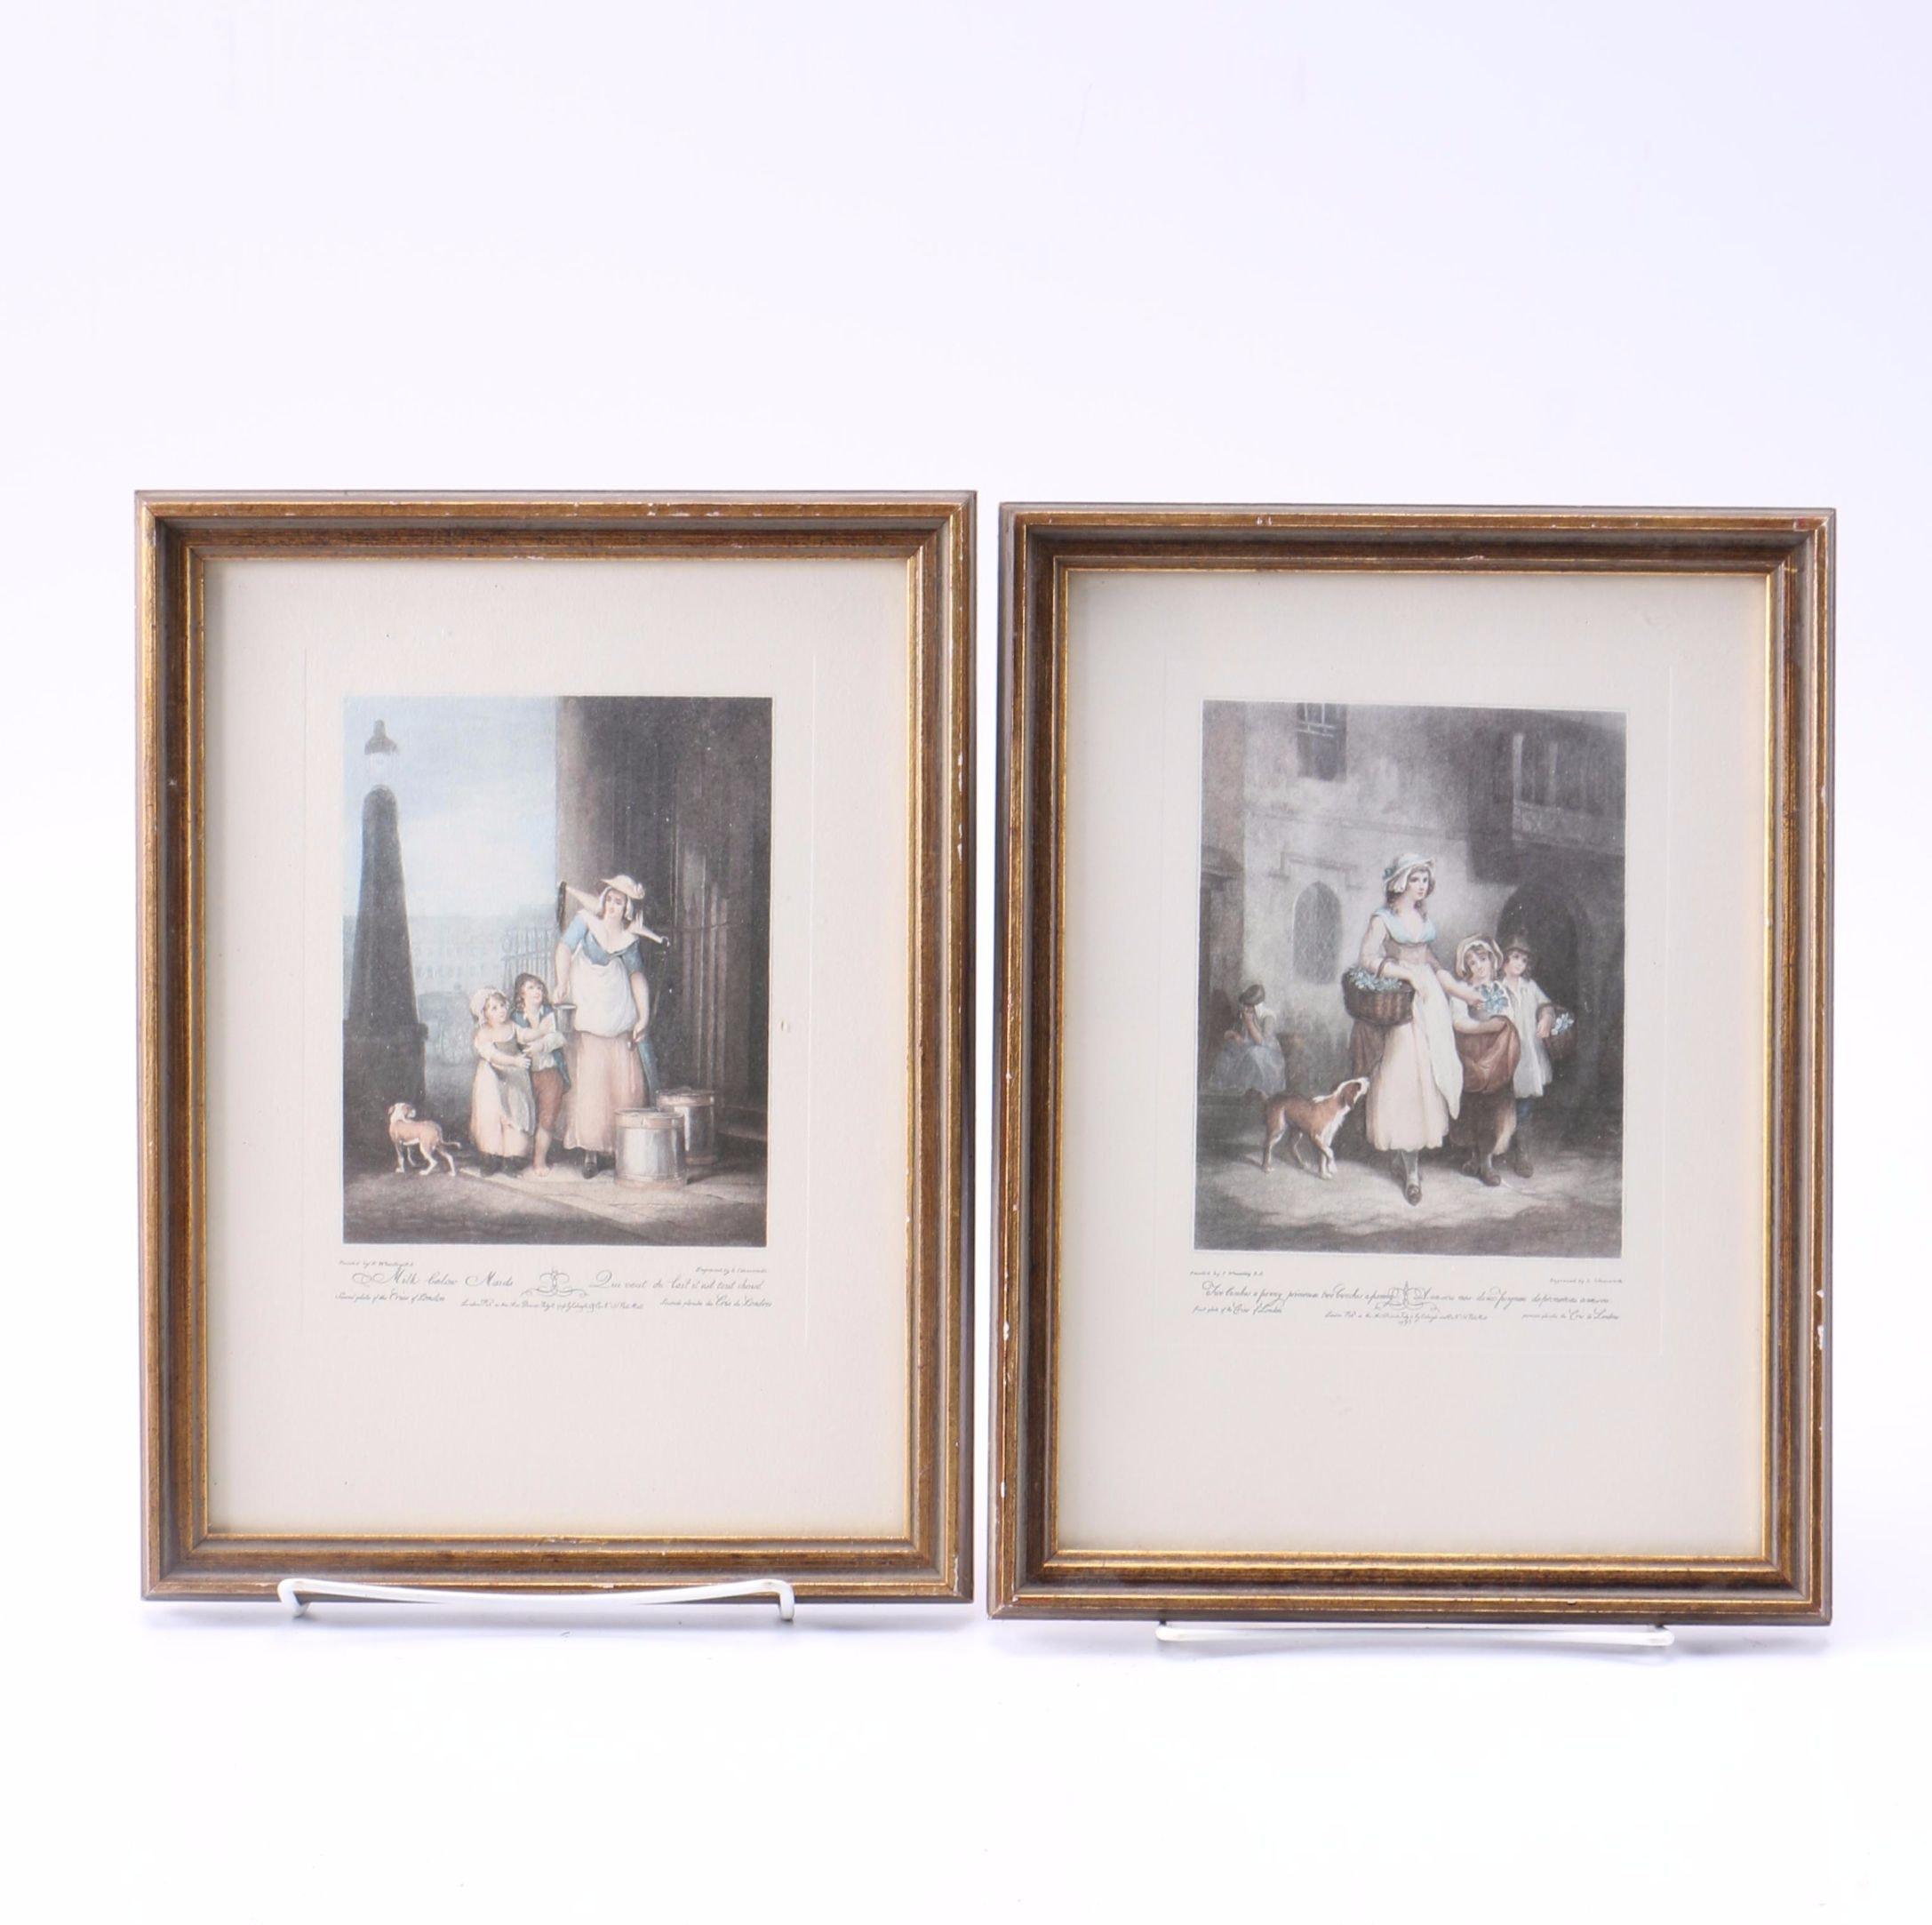 Offset Lithographs After Luigi Schiavonetti Engravings